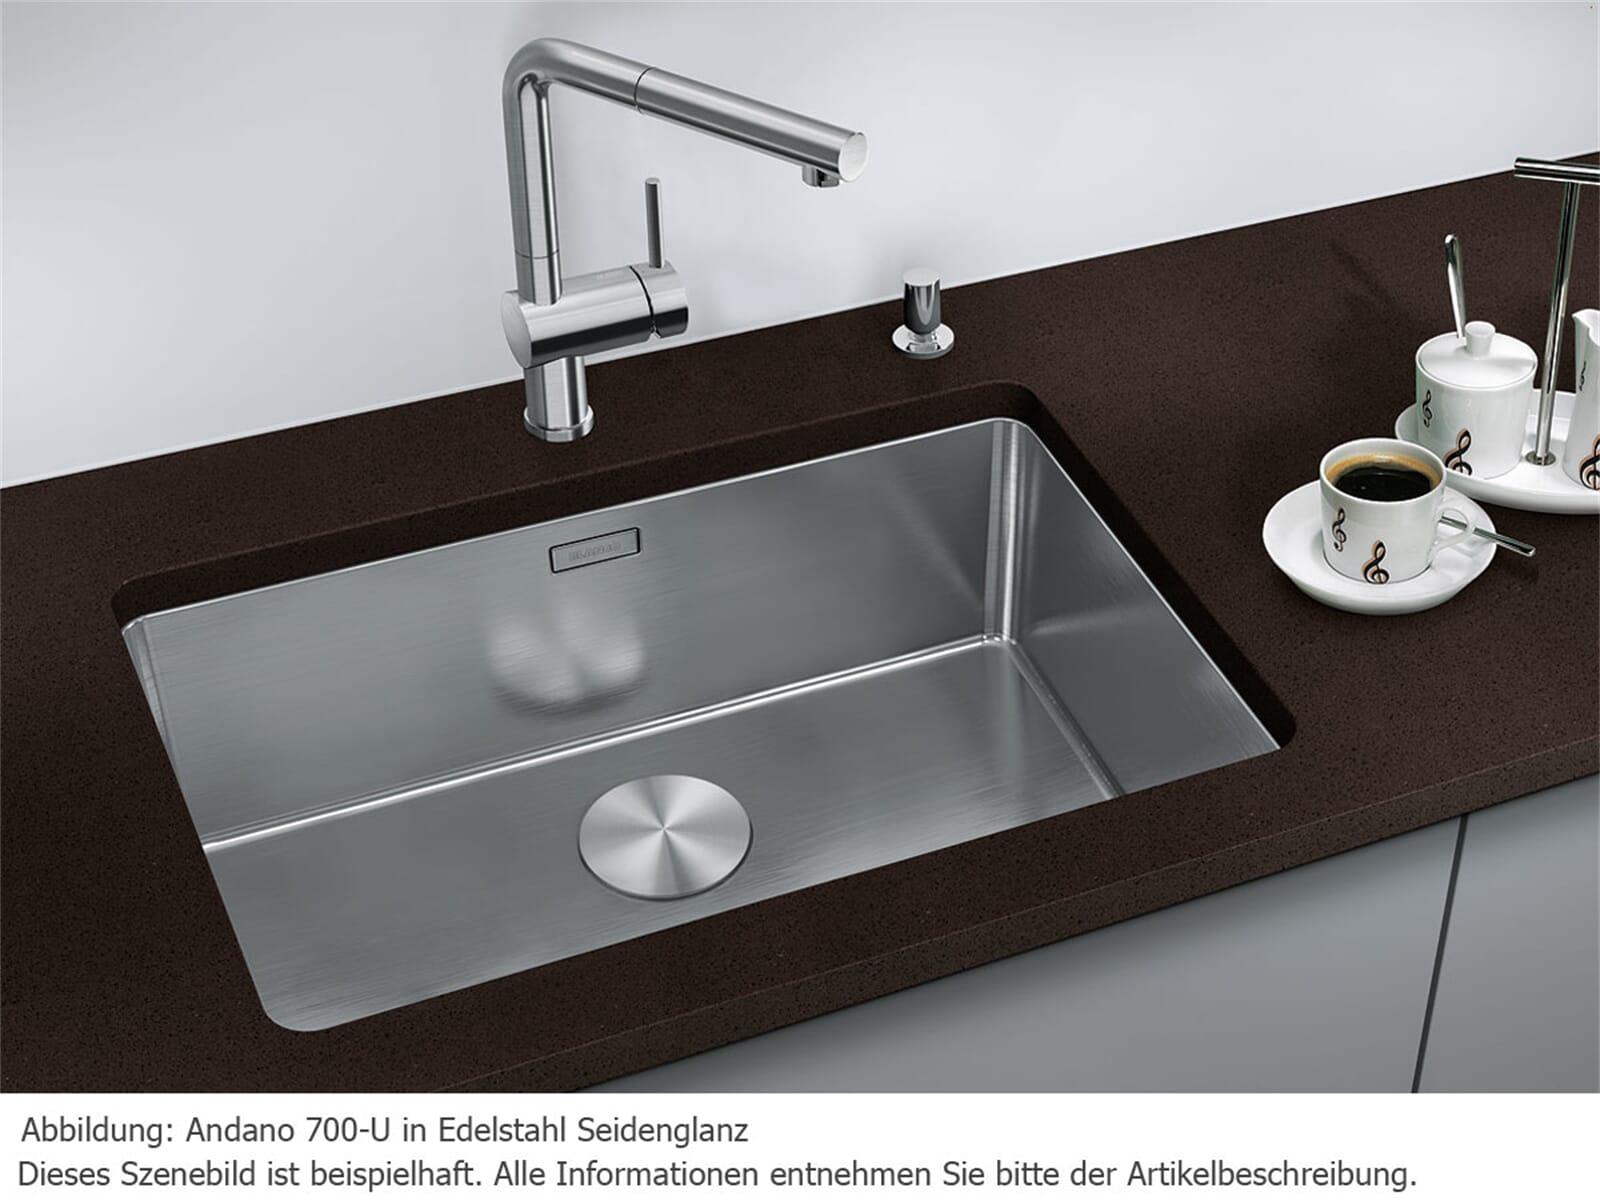 blanco andano 700 u edelstahlsp le seidenglanz ebay. Black Bedroom Furniture Sets. Home Design Ideas